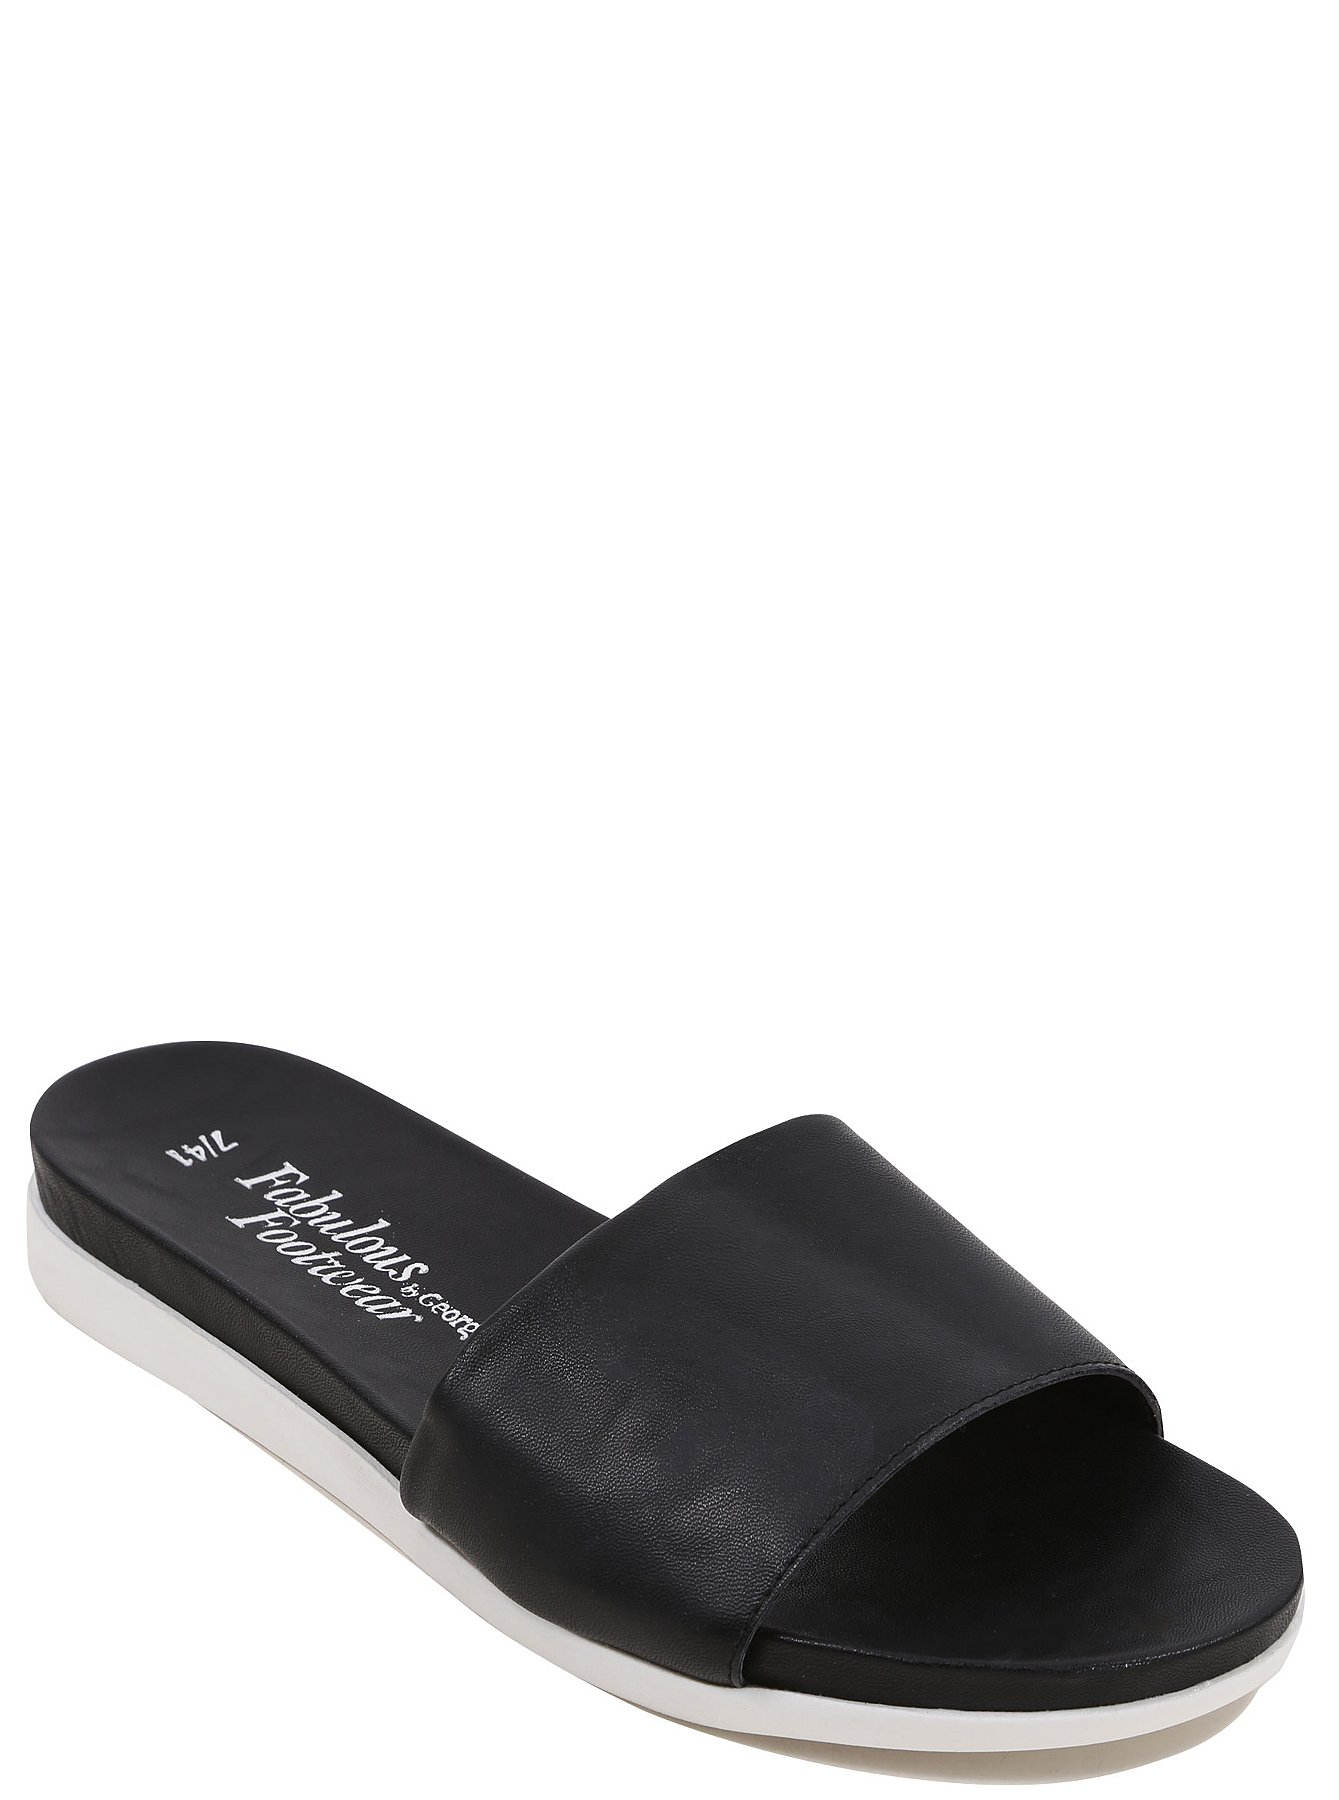 Black sandals asda - Black Sandals Asda 28